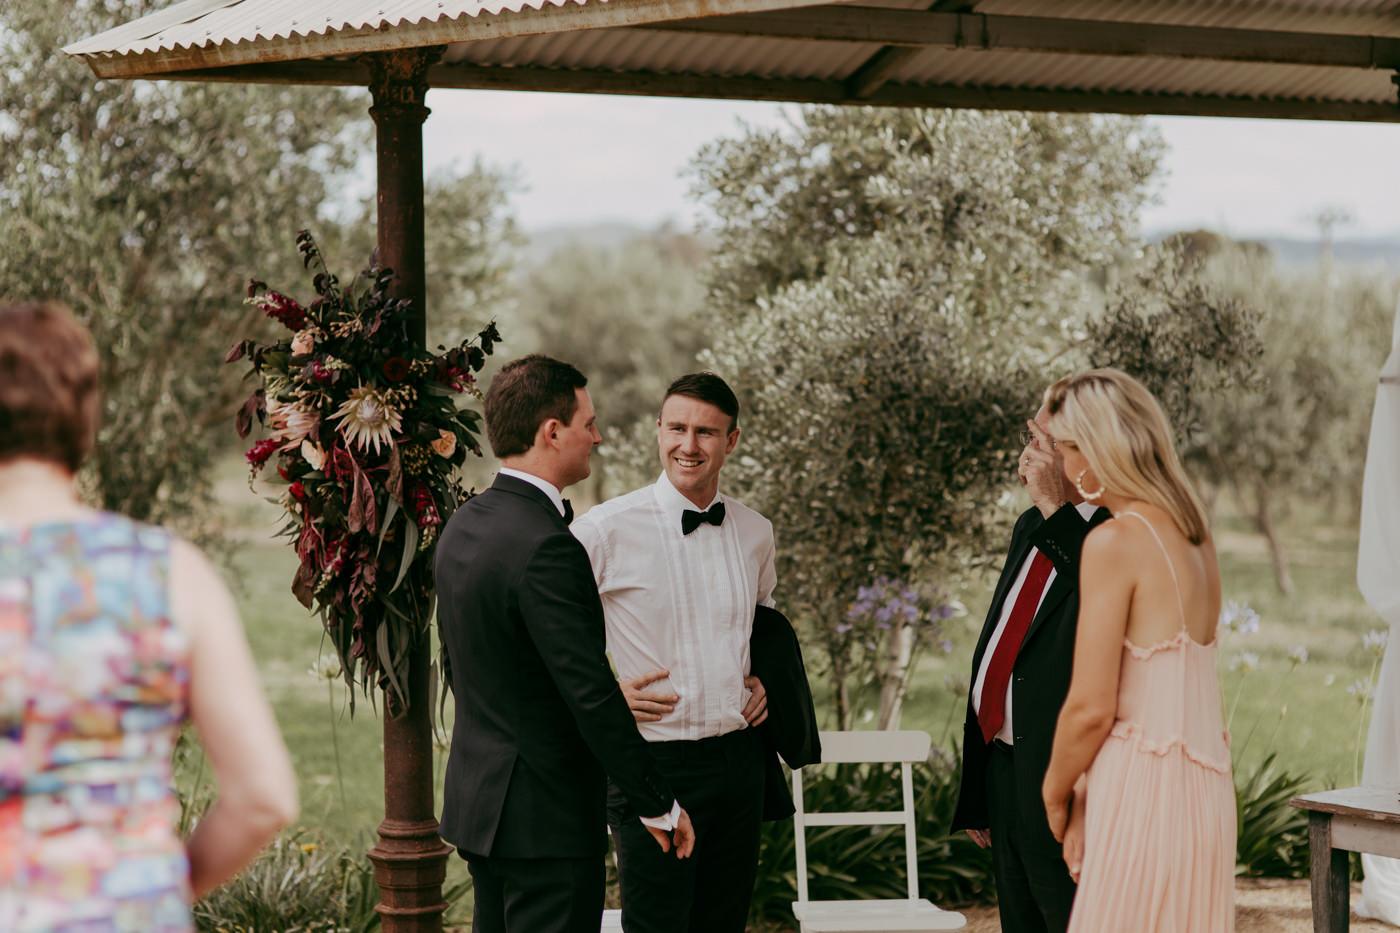 Anthony & Eliet - Wagga Wagga Wedding - Country NSW - Samantha Heather Photography-94.jpg